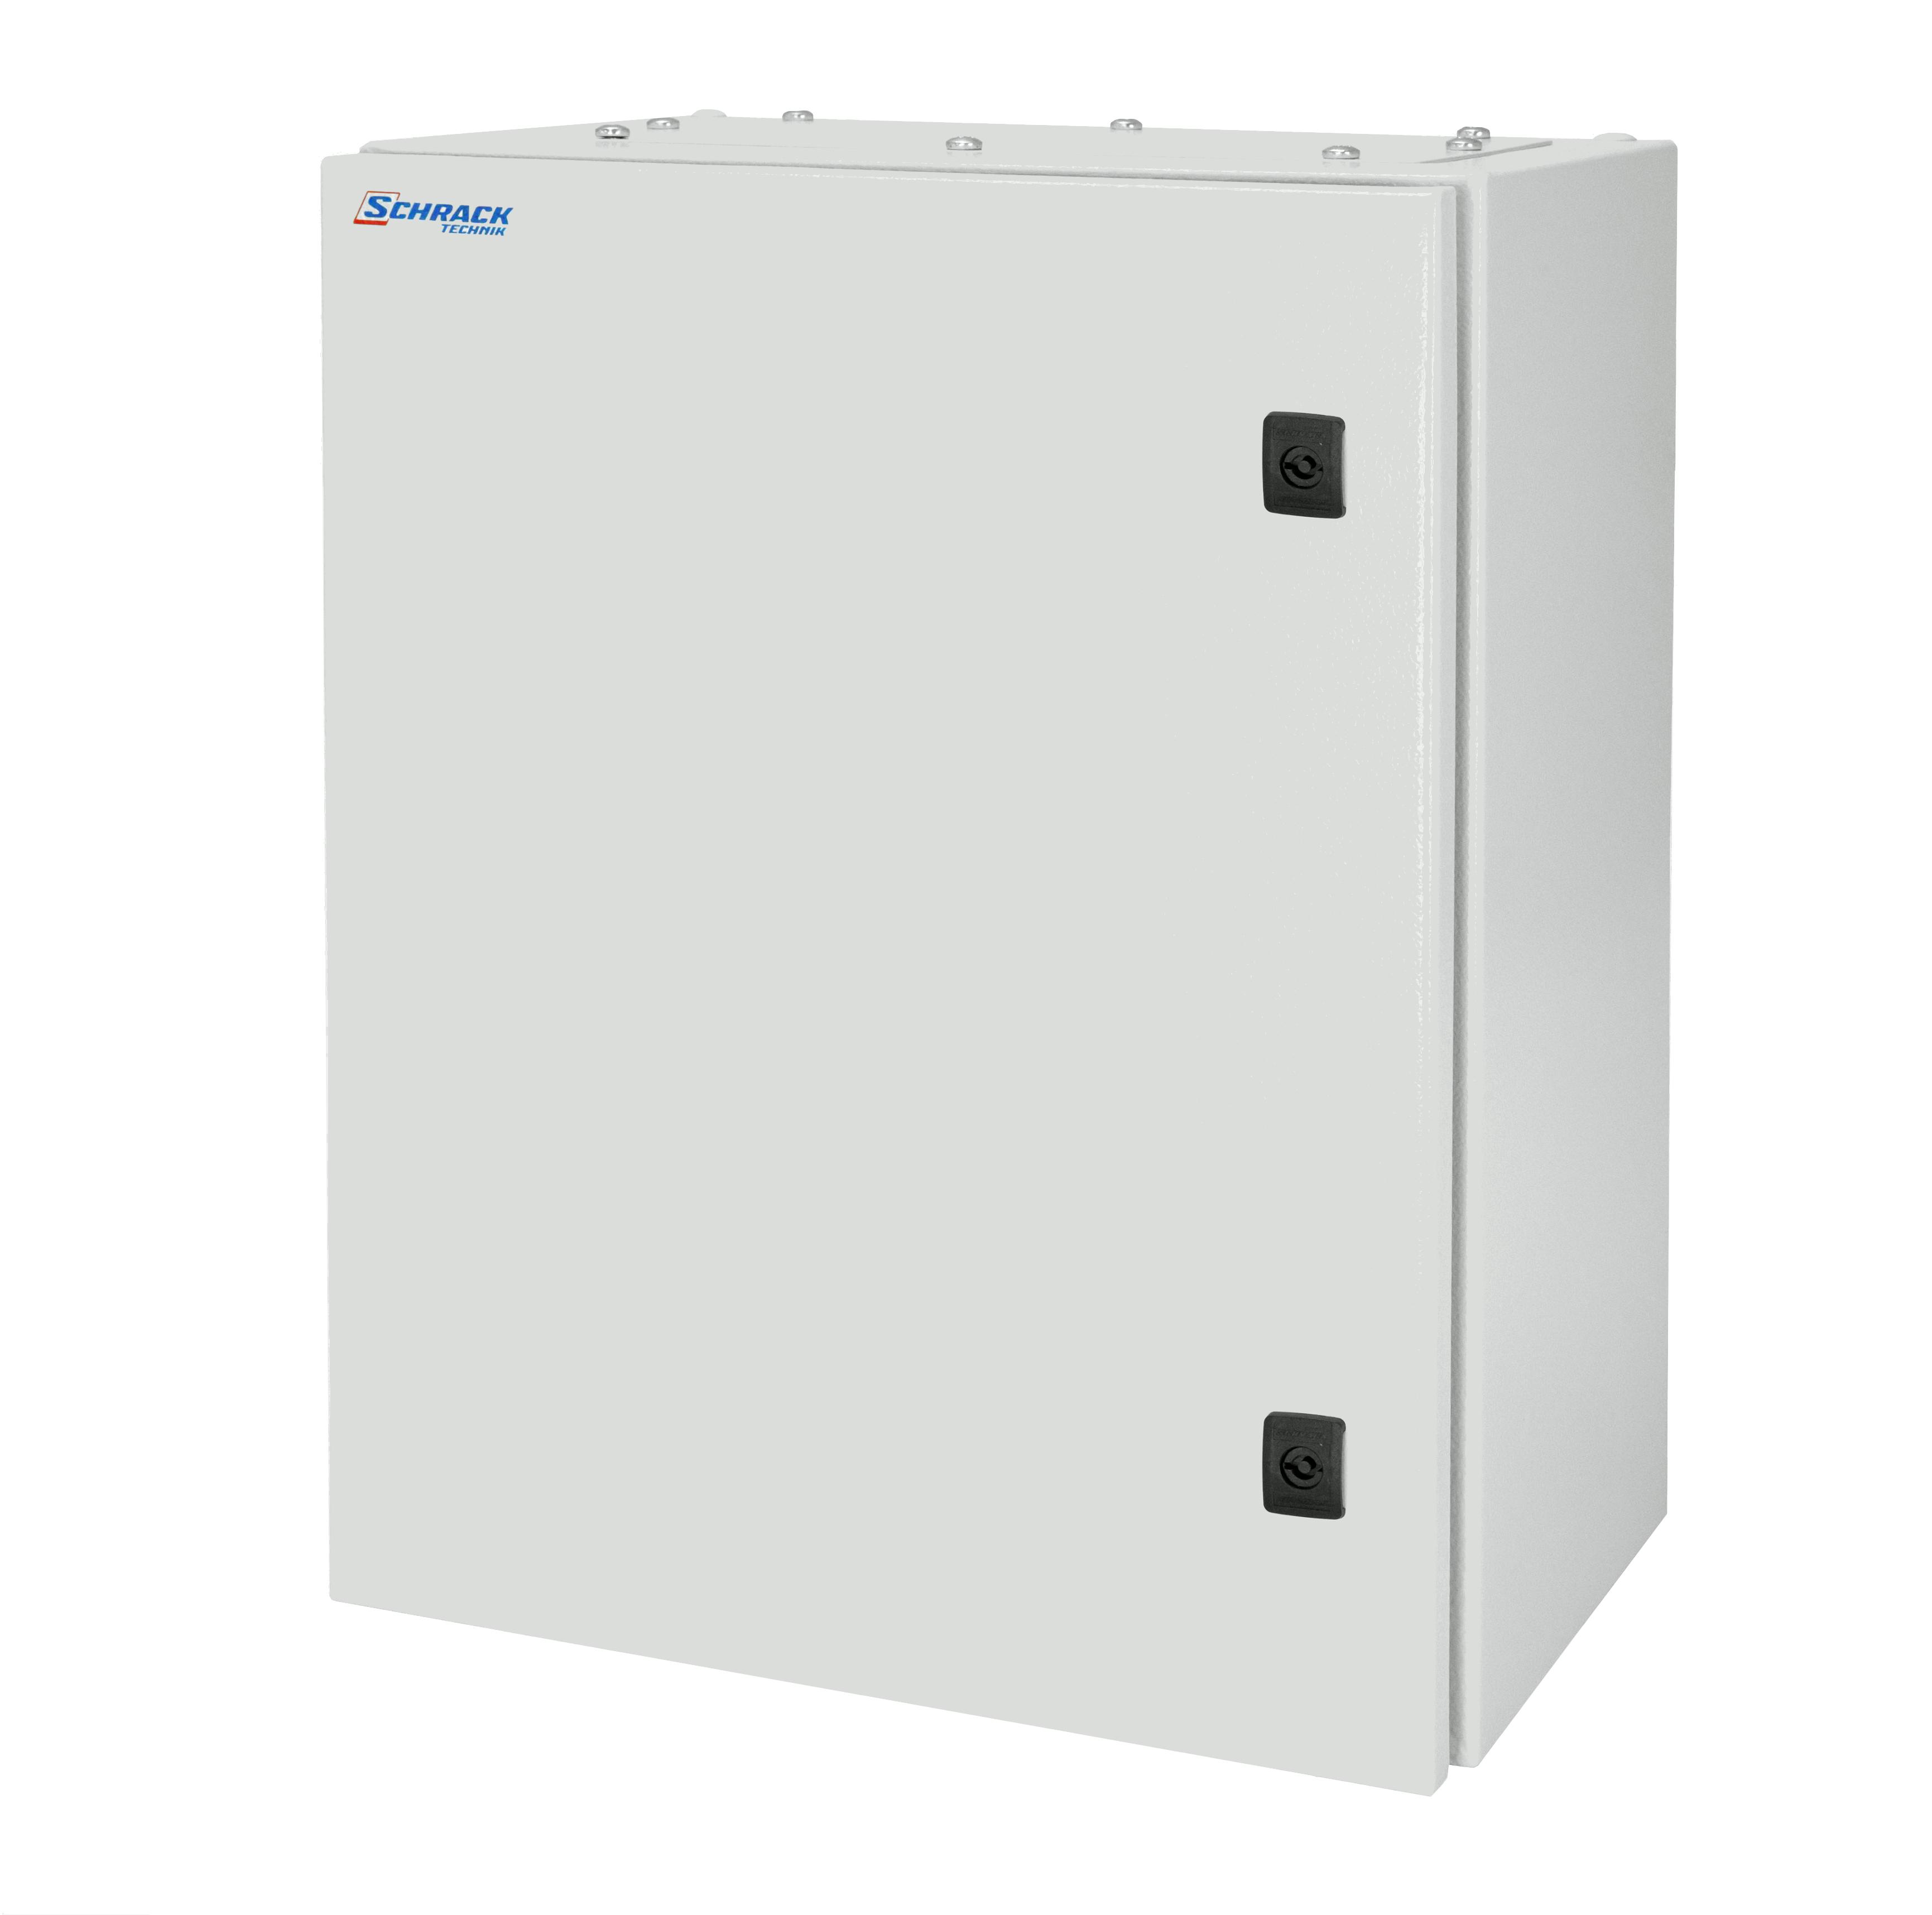 1 Stk Wandschrank Mono IP66 H=600 B=400 T=300 Stahlblech WSM6040300